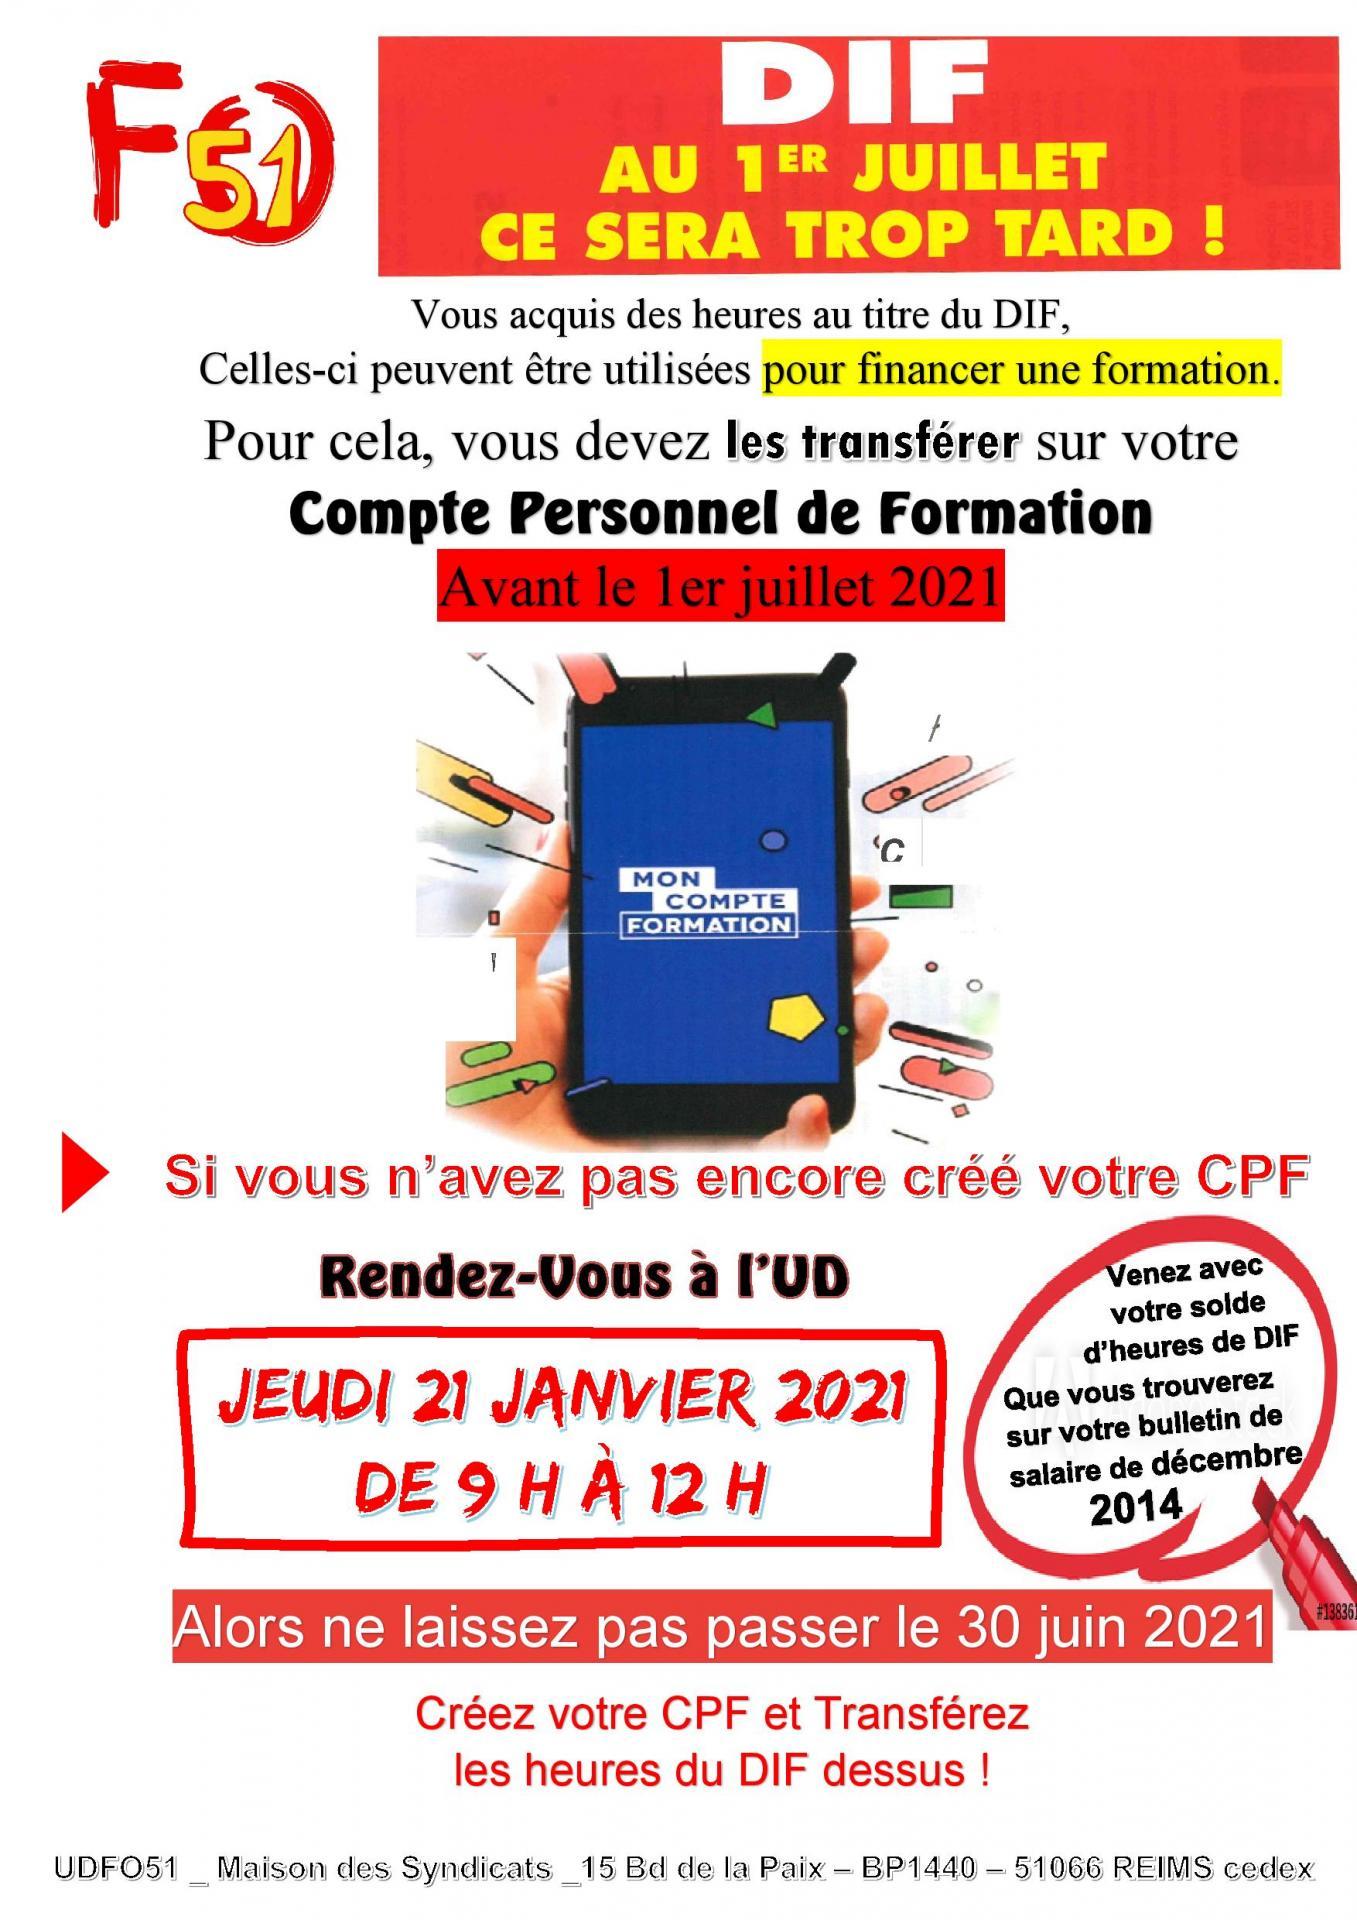 Cpf dif 2